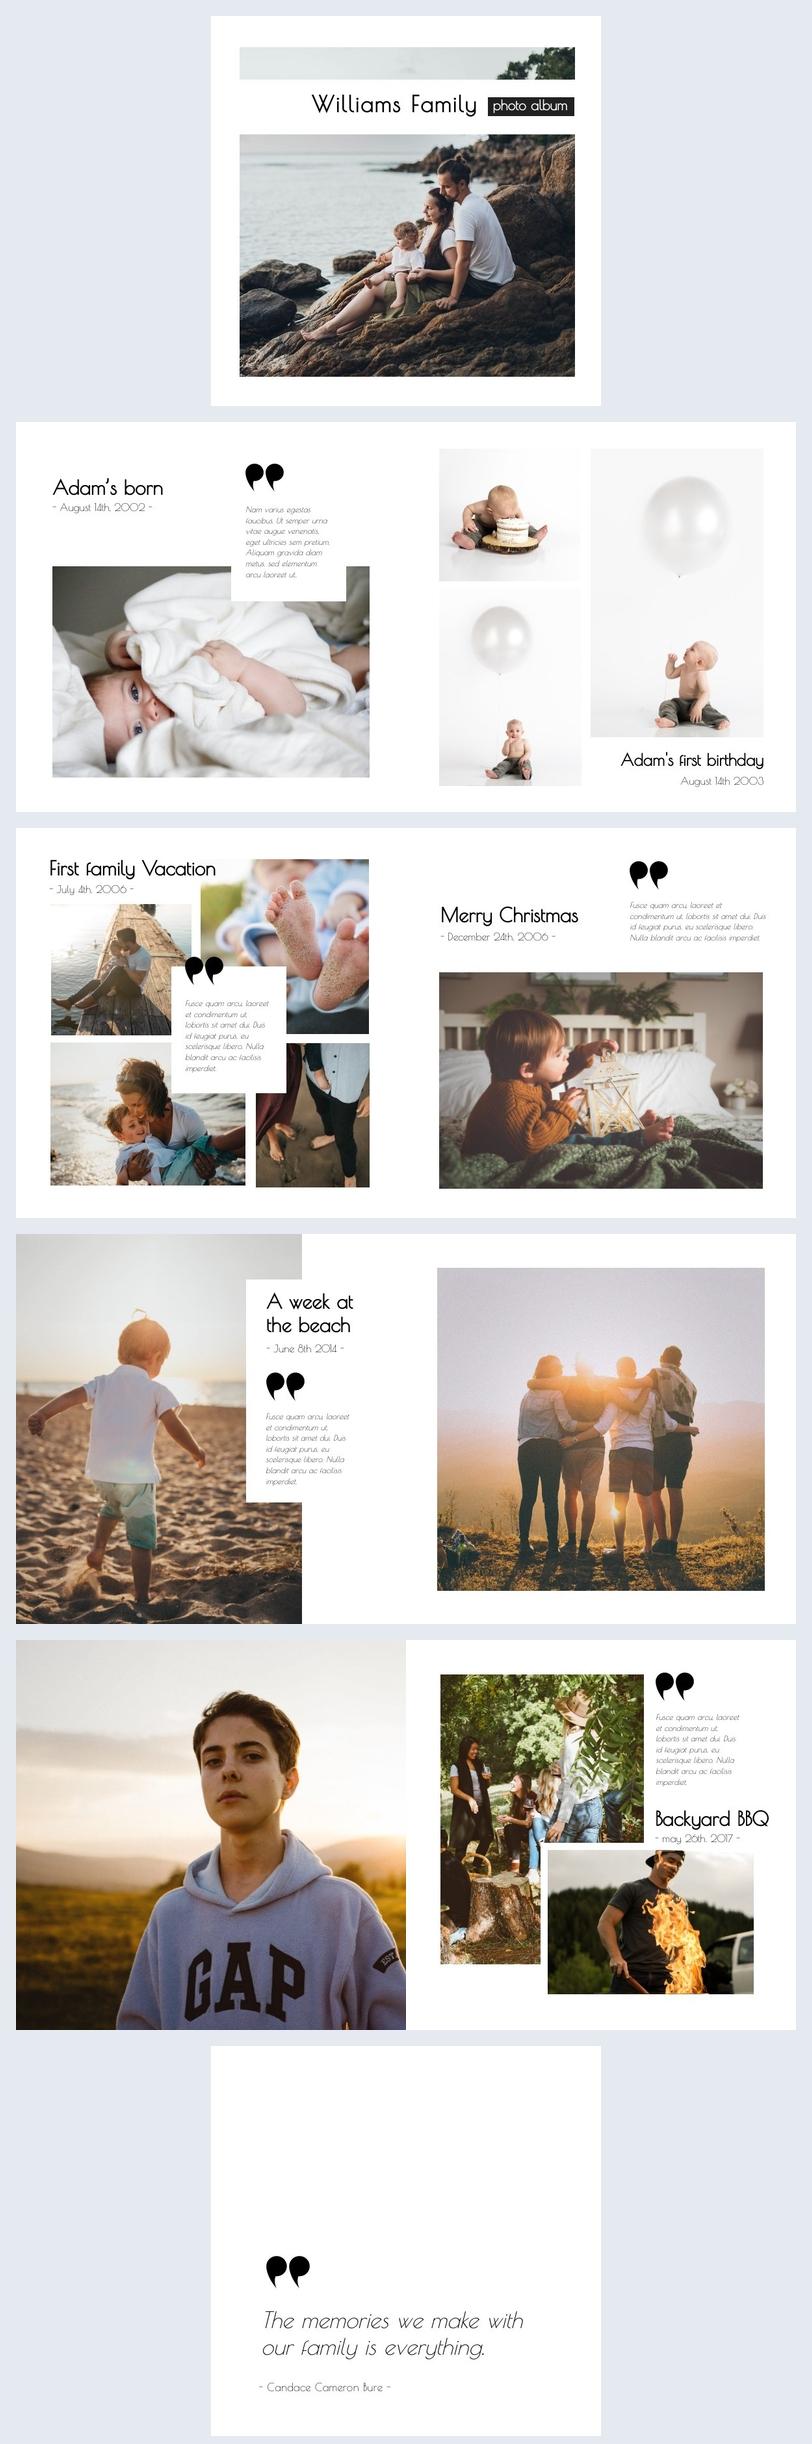 Exemplo de Modelo de Álbum de Fotos de Família Online